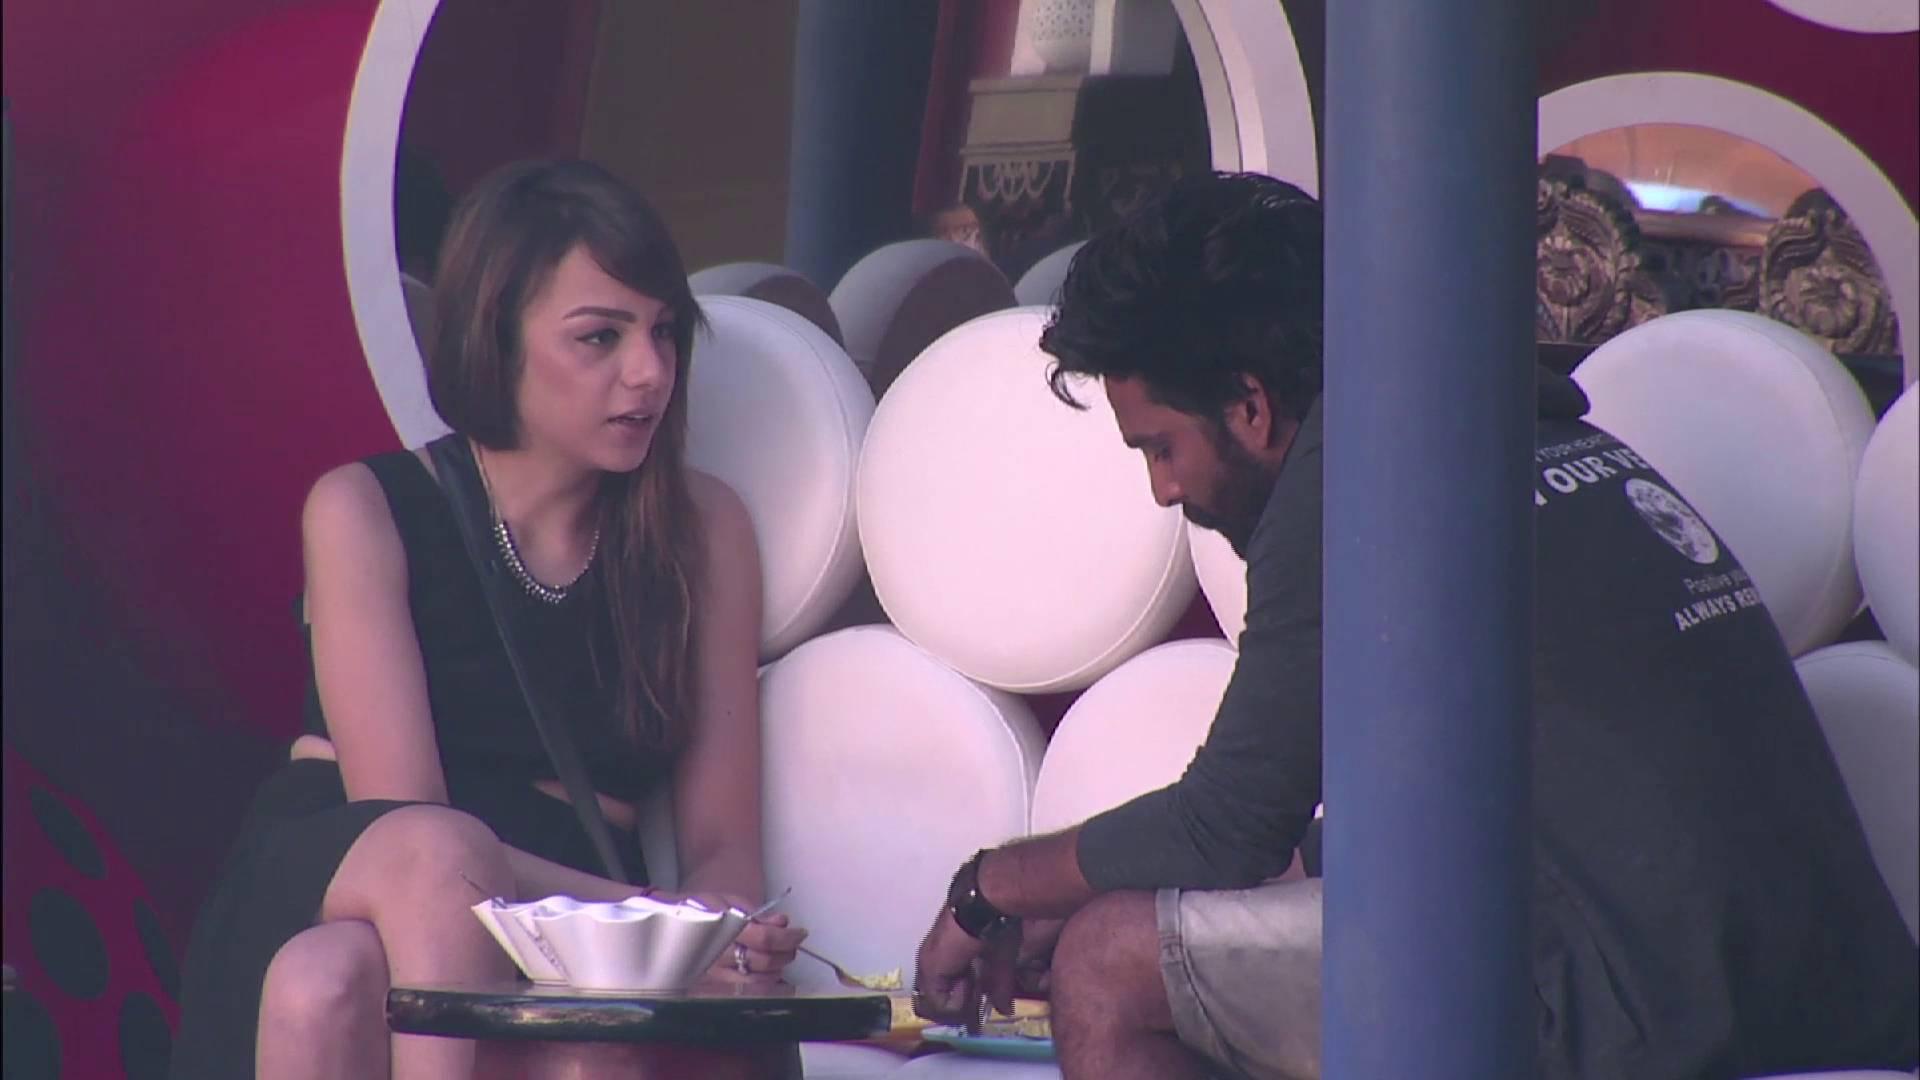 Andekha Action: Manu and Priyanka are watching over Manveer and Nitibha!